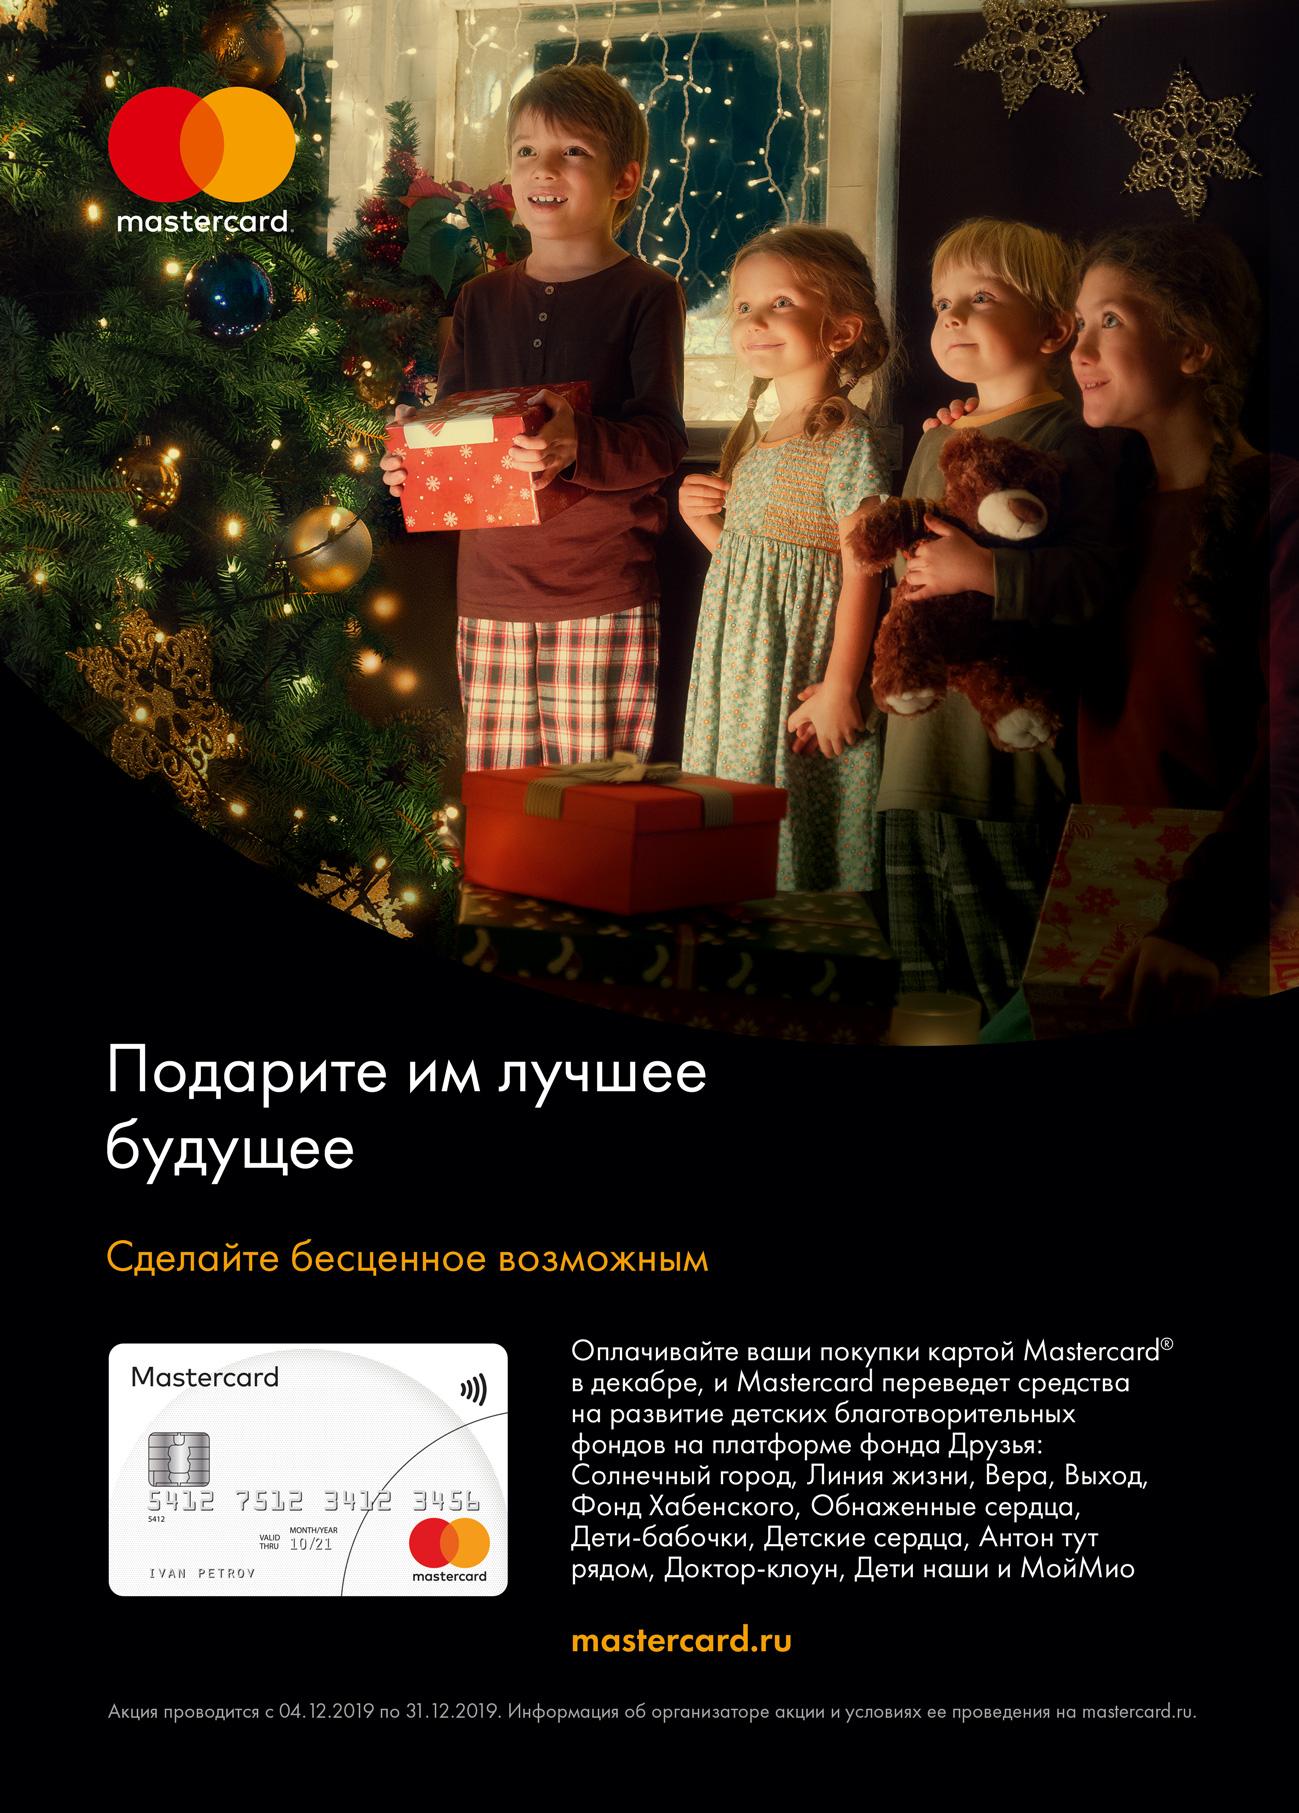 C_Charity-2020_KV_4Child_A4.jpg